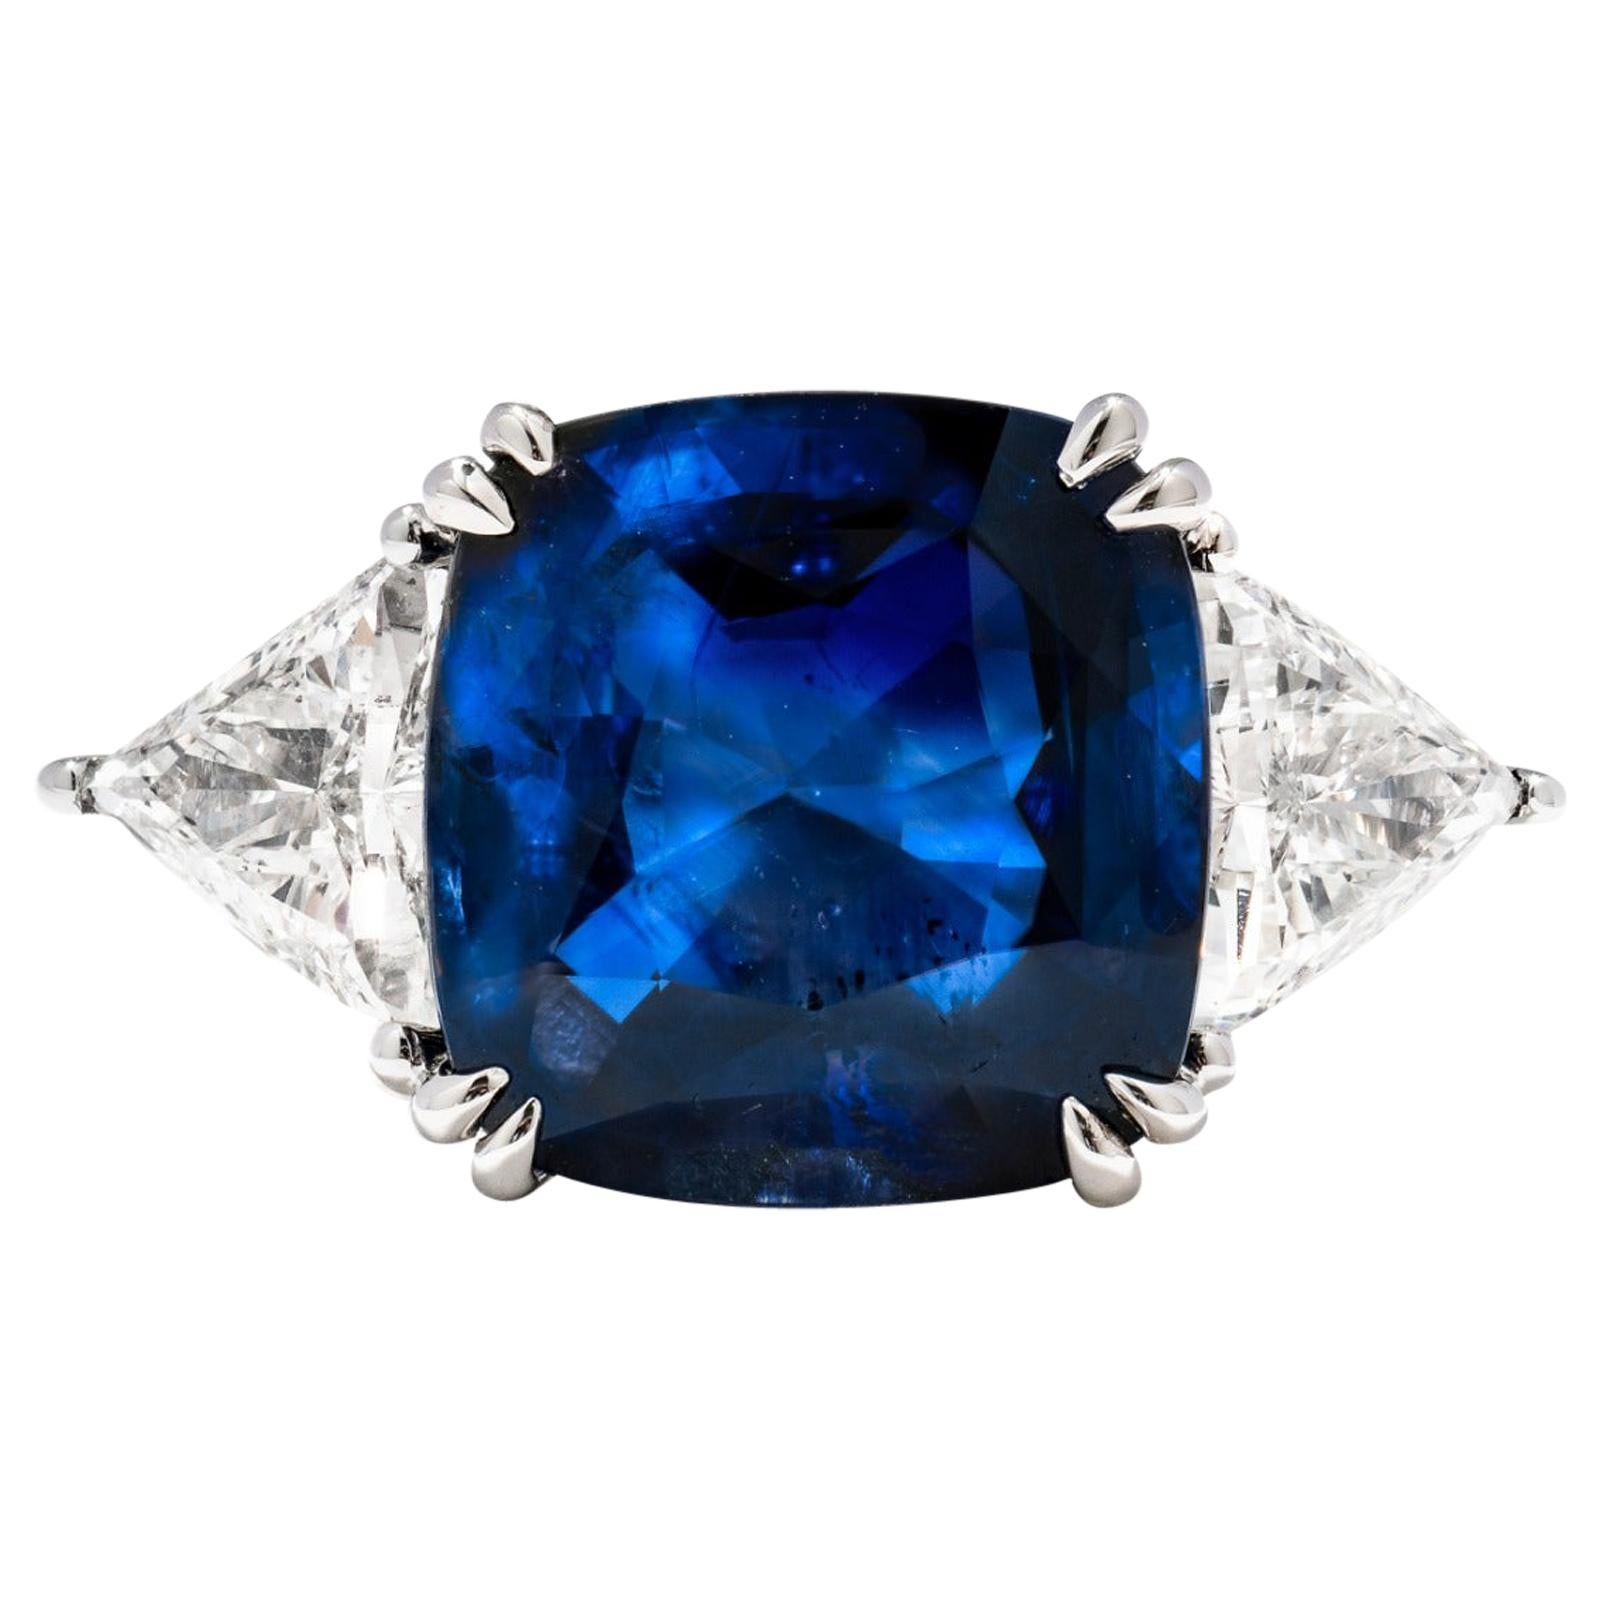 8.15 Carat Royal Blue Sapphire GRS Certified Unheated Diamond Ceylon Ring